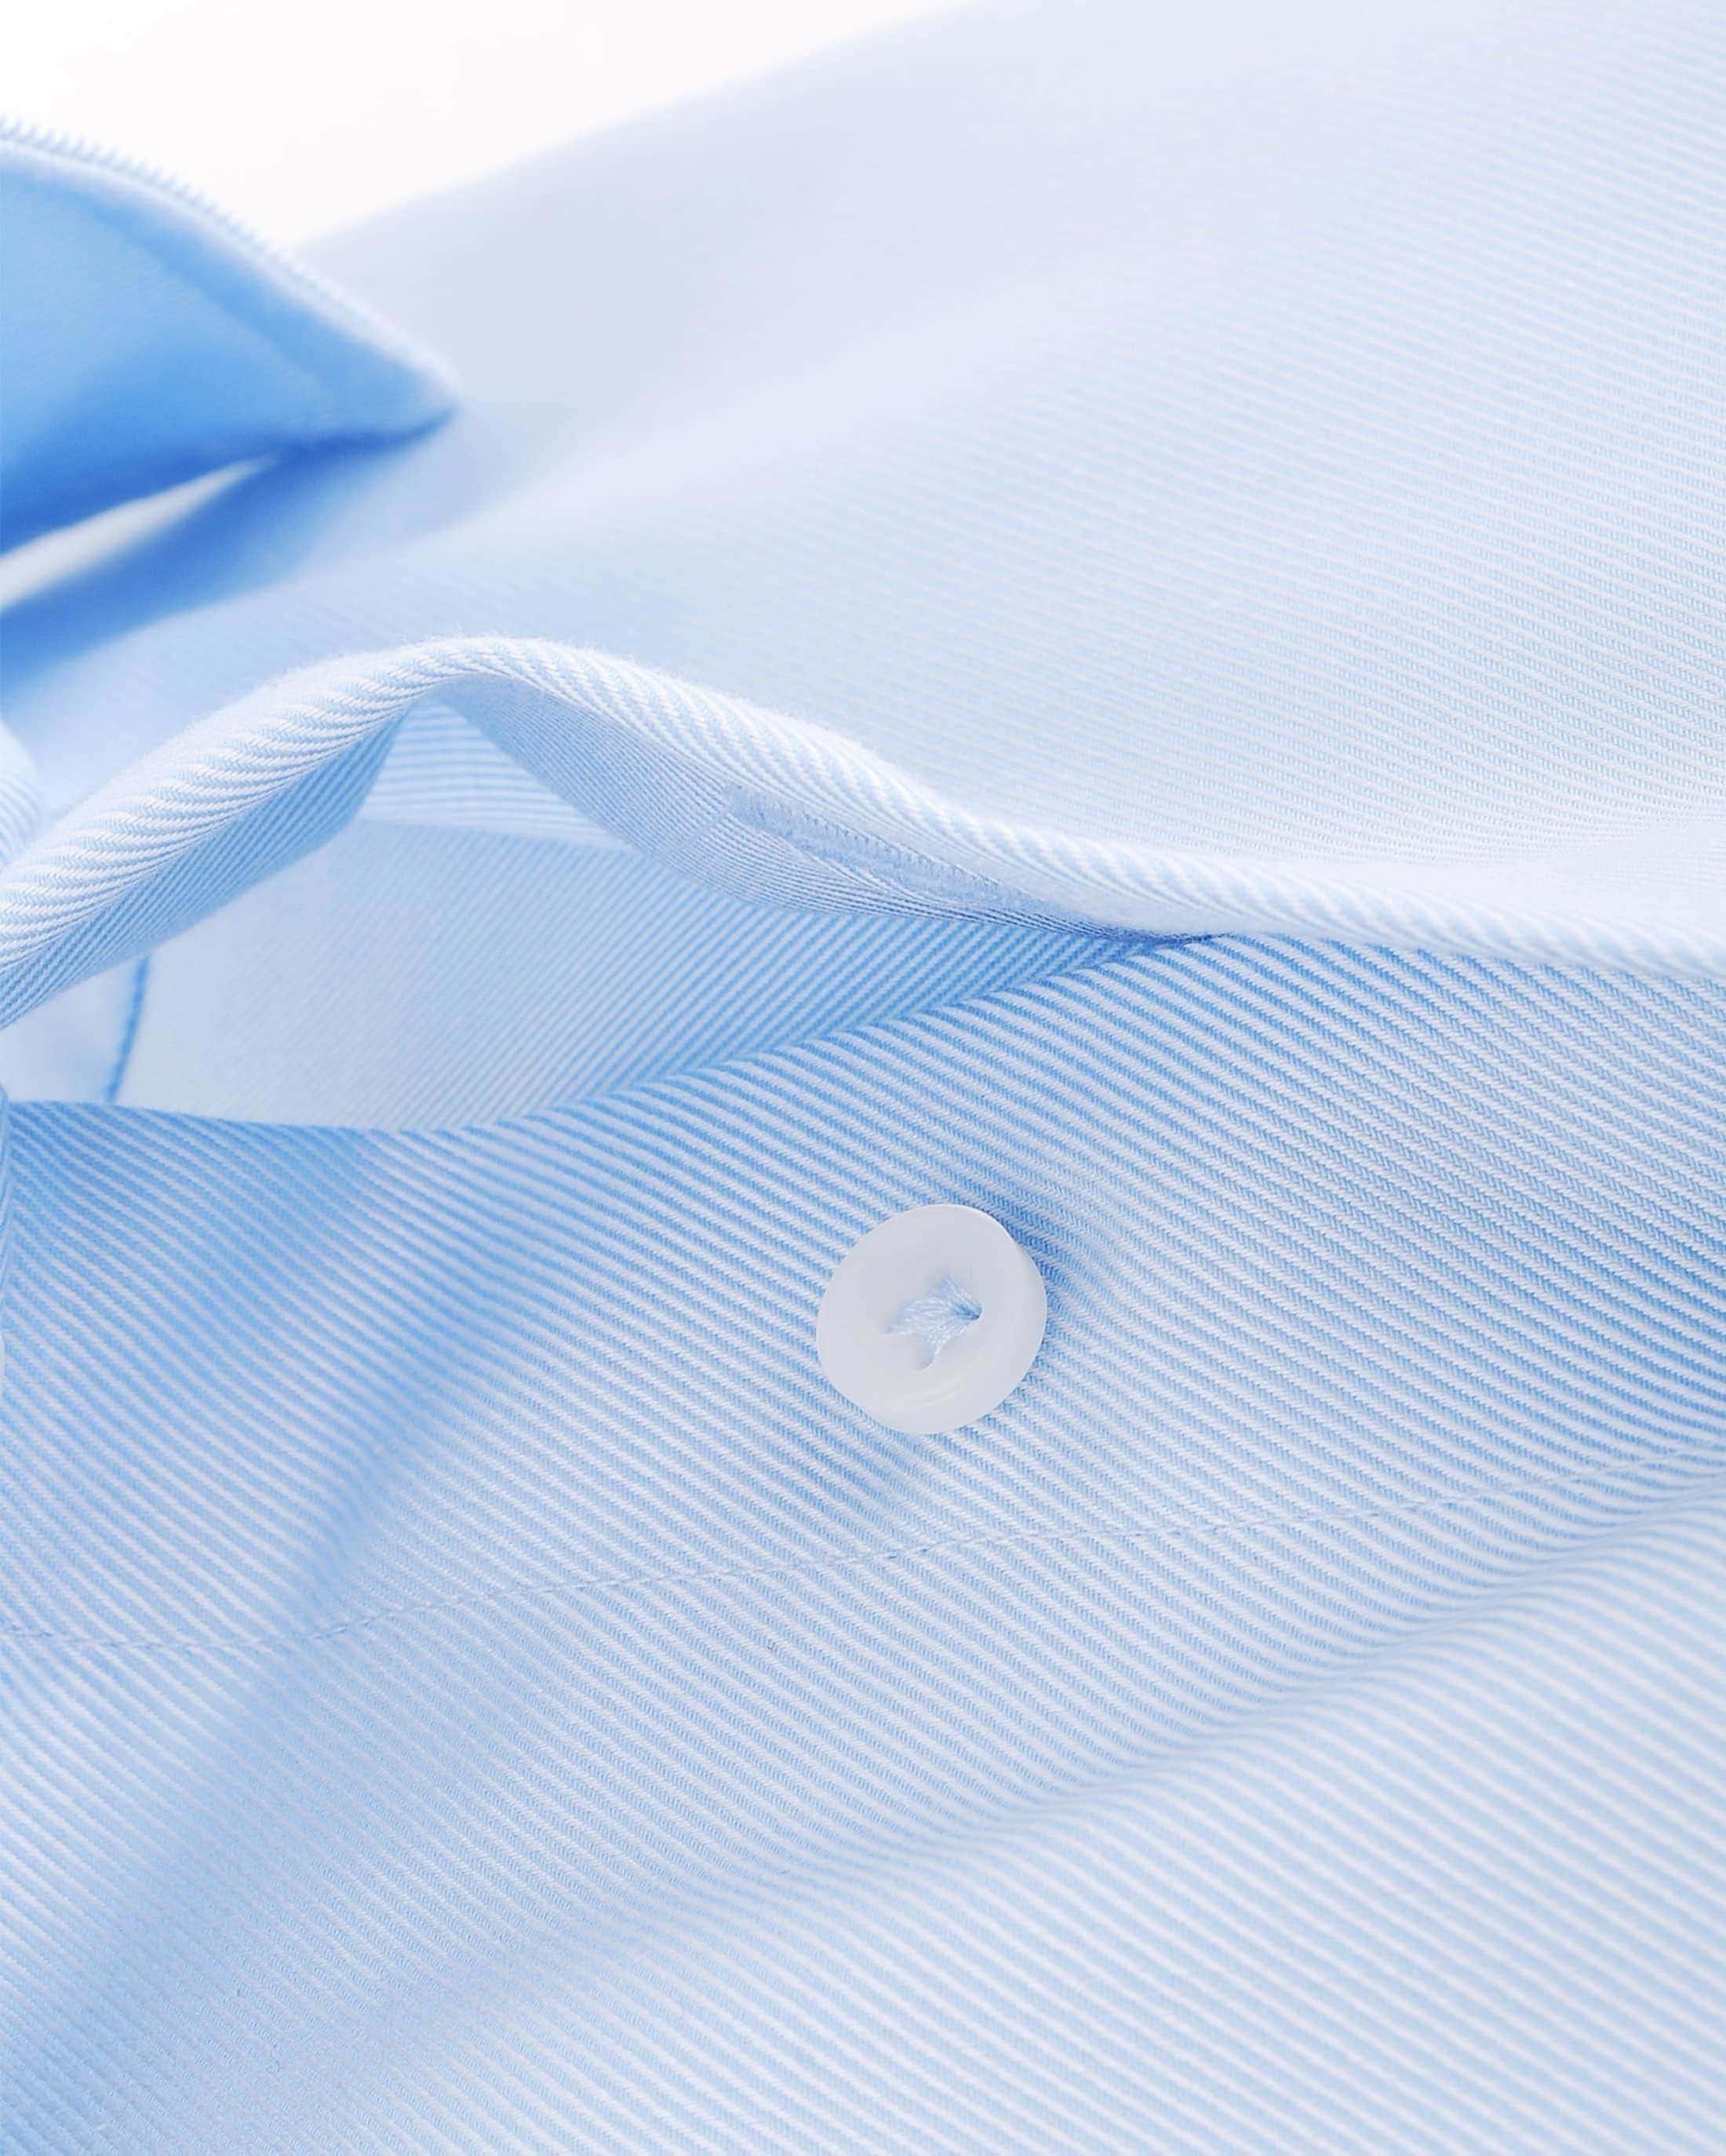 Profuomo shirt Blue + White Contrast foto 2